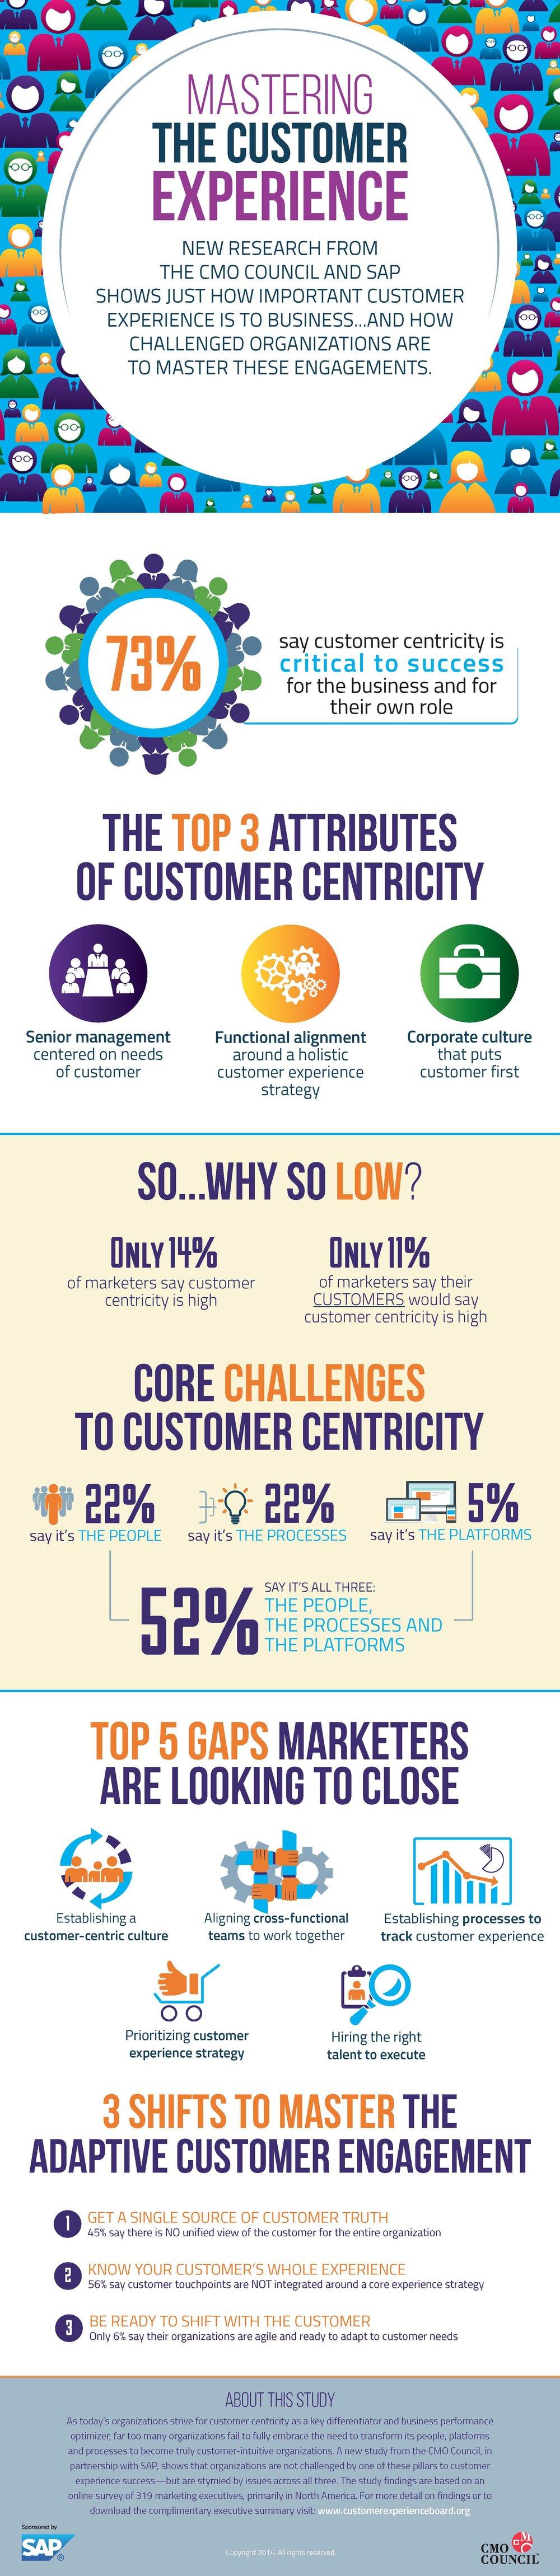 SAP_Infographic.jpg